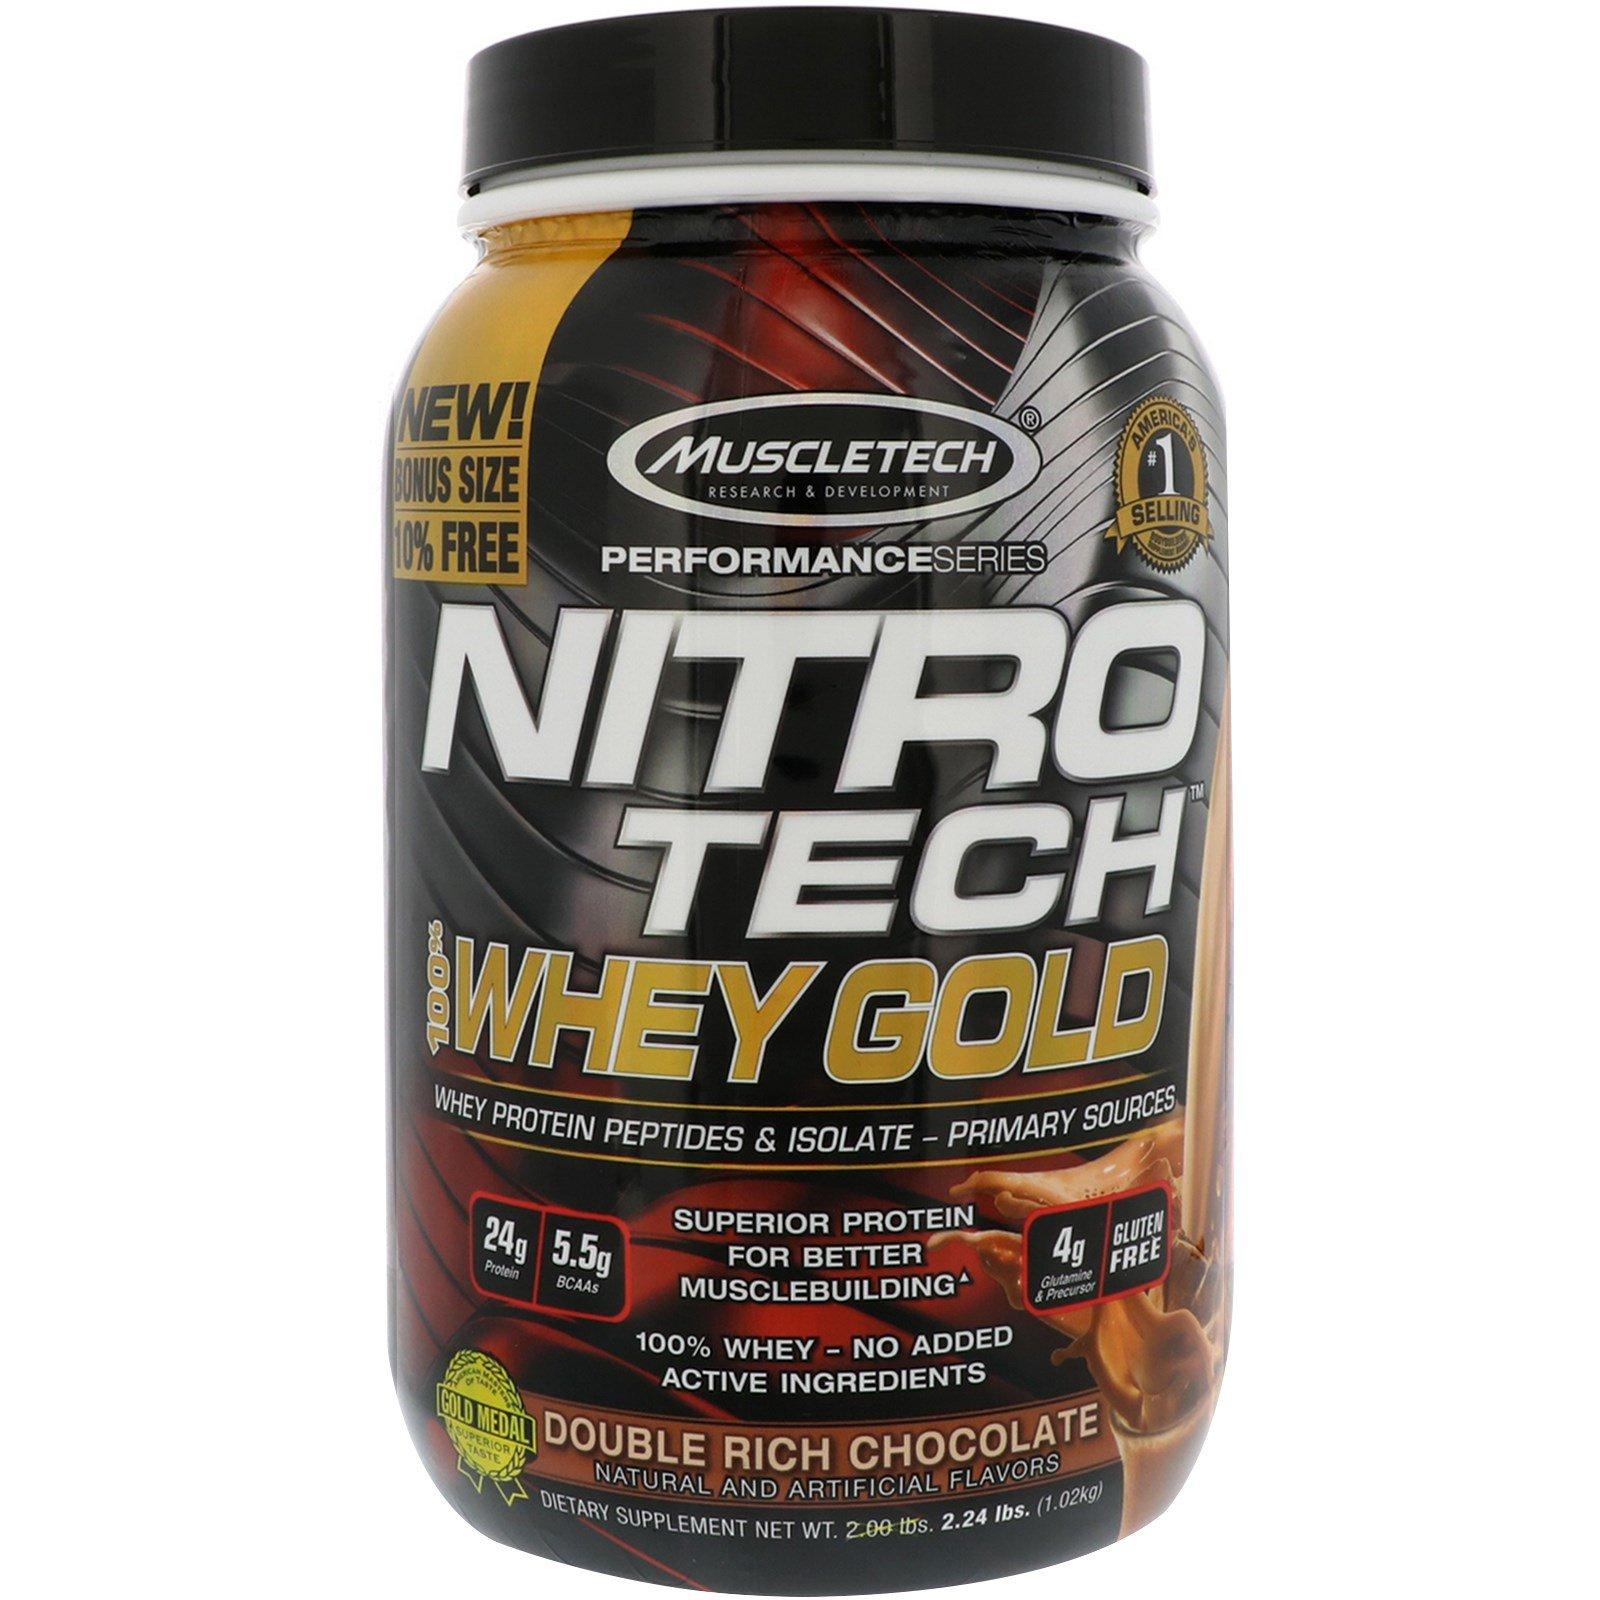 Muscletech, Nitro Tech, 100% сыворотка Gold, Двойной шоколад, 2.24 фунта (1.02кг)